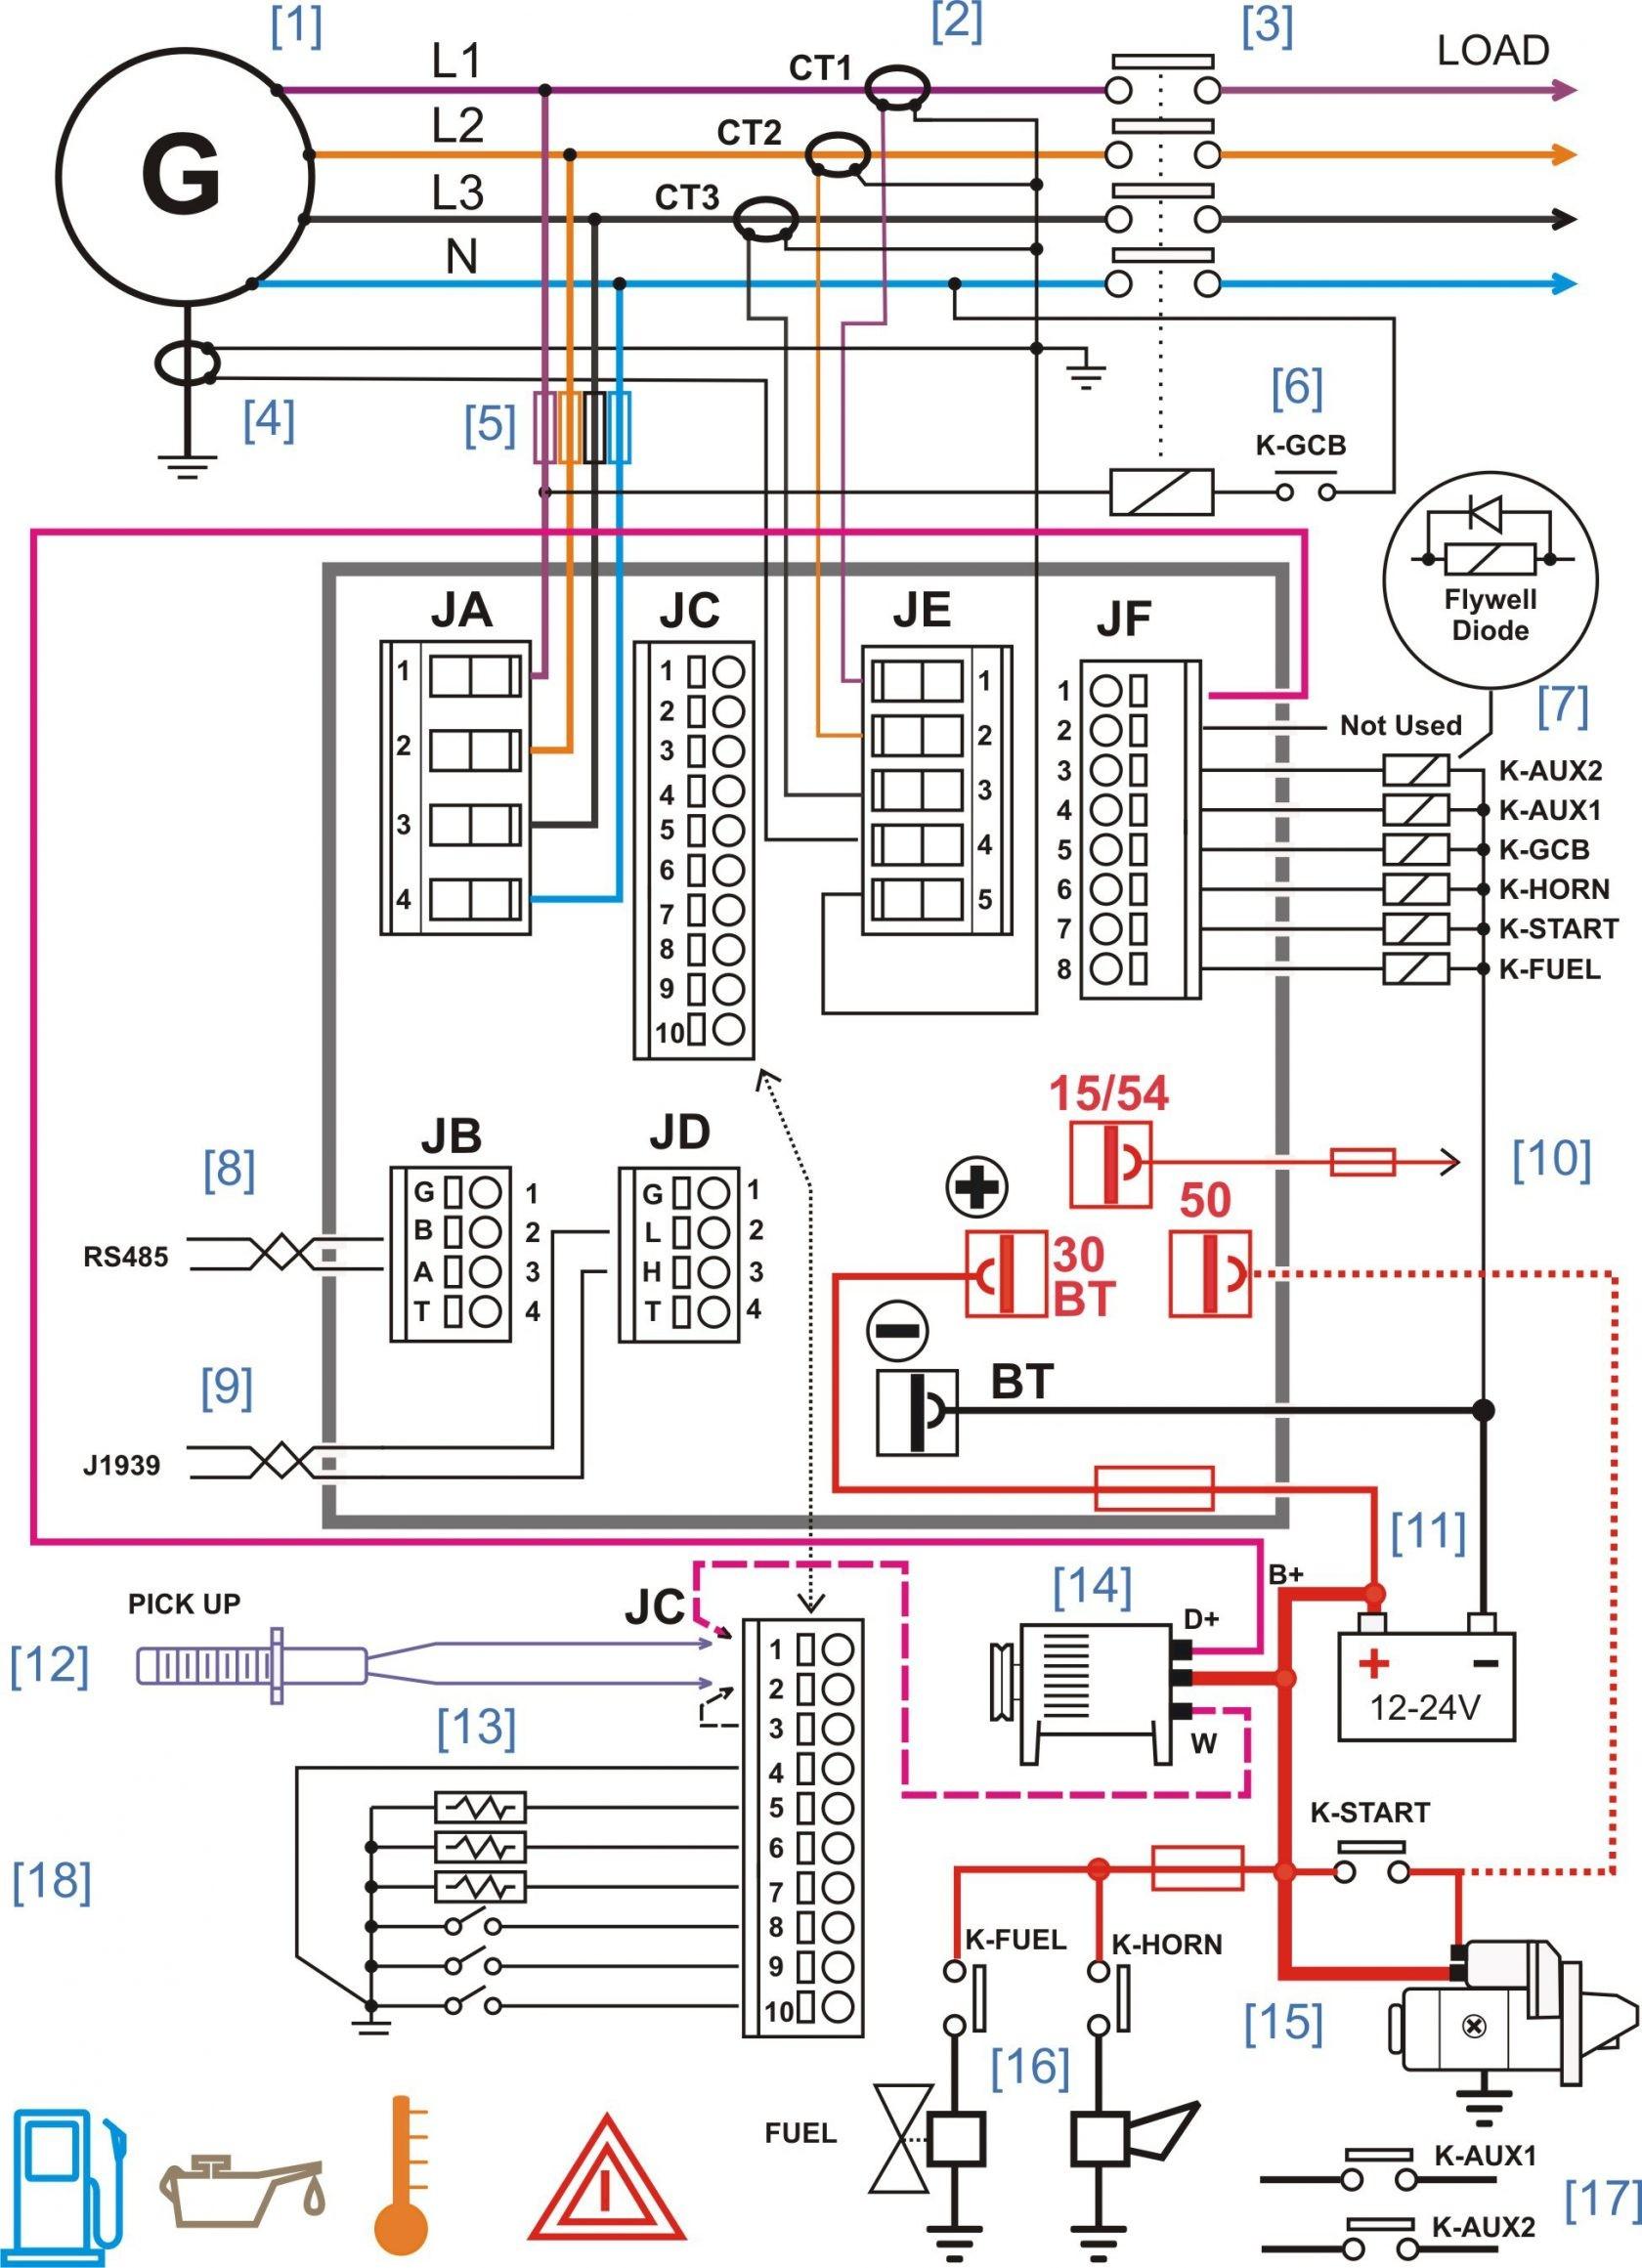 Electrical Engineering Wiring Diagram Wiring Diagram Delco Radio Model Wiring Diagram Of Electrical Engineering Wiring Diagram